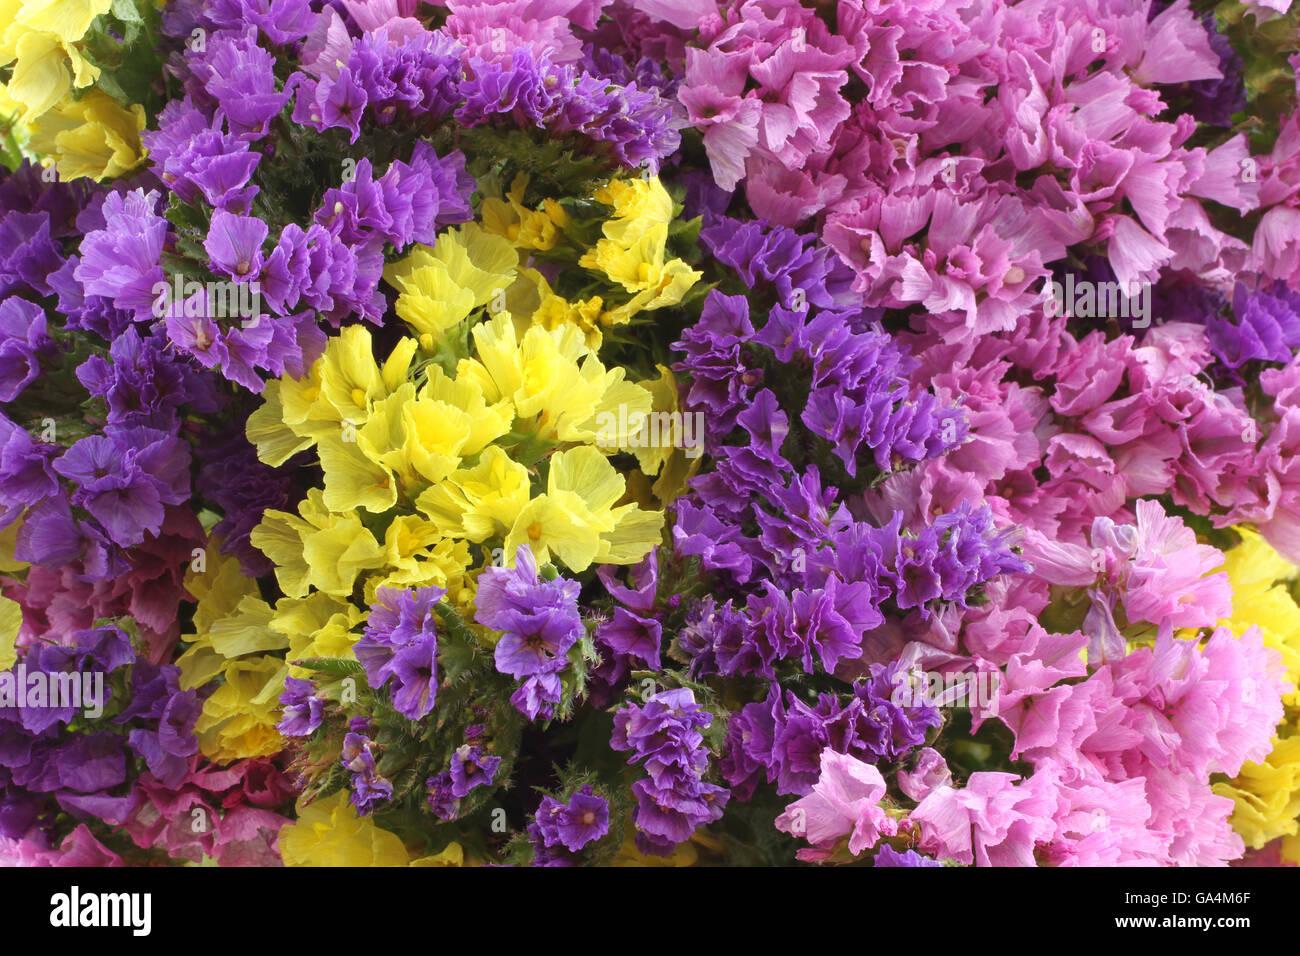 Statice flower stock photos statice flower stock images alamy pink purple yellow statice flowers limonium background stock image mightylinksfo